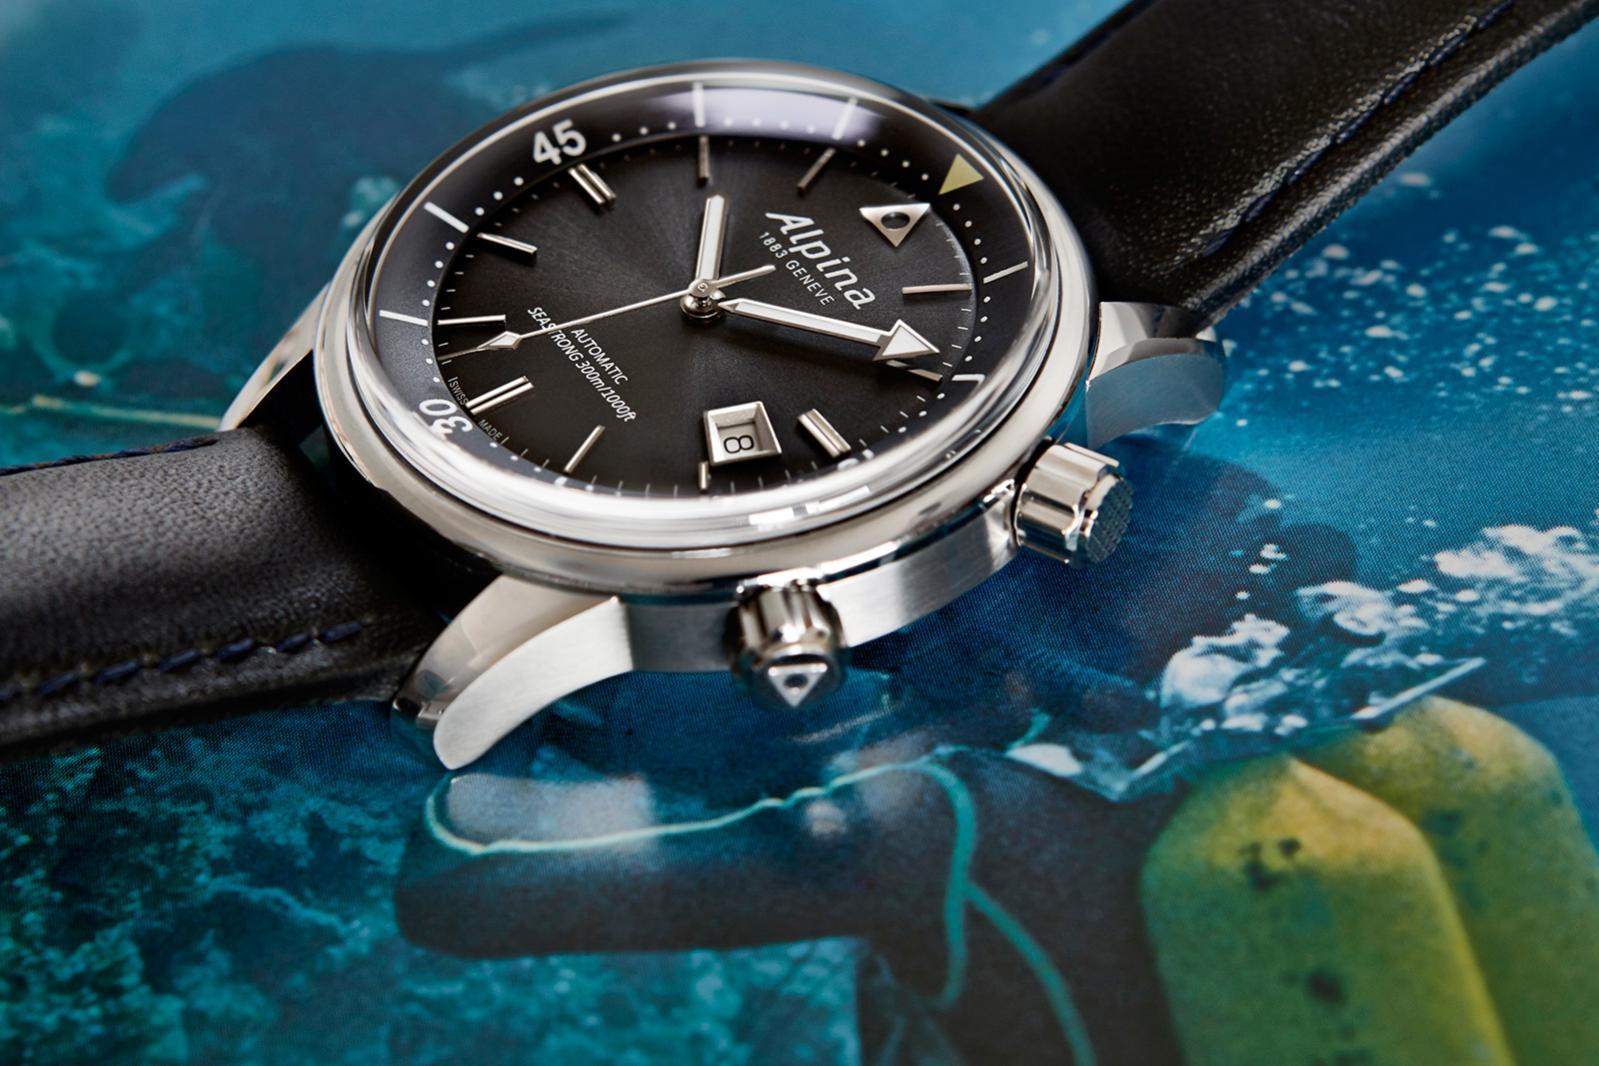 Naziv: Alpina-Seastrong-Diver-Heritage-2.jpg, pregleda: 239, veličina: 191,3 KB